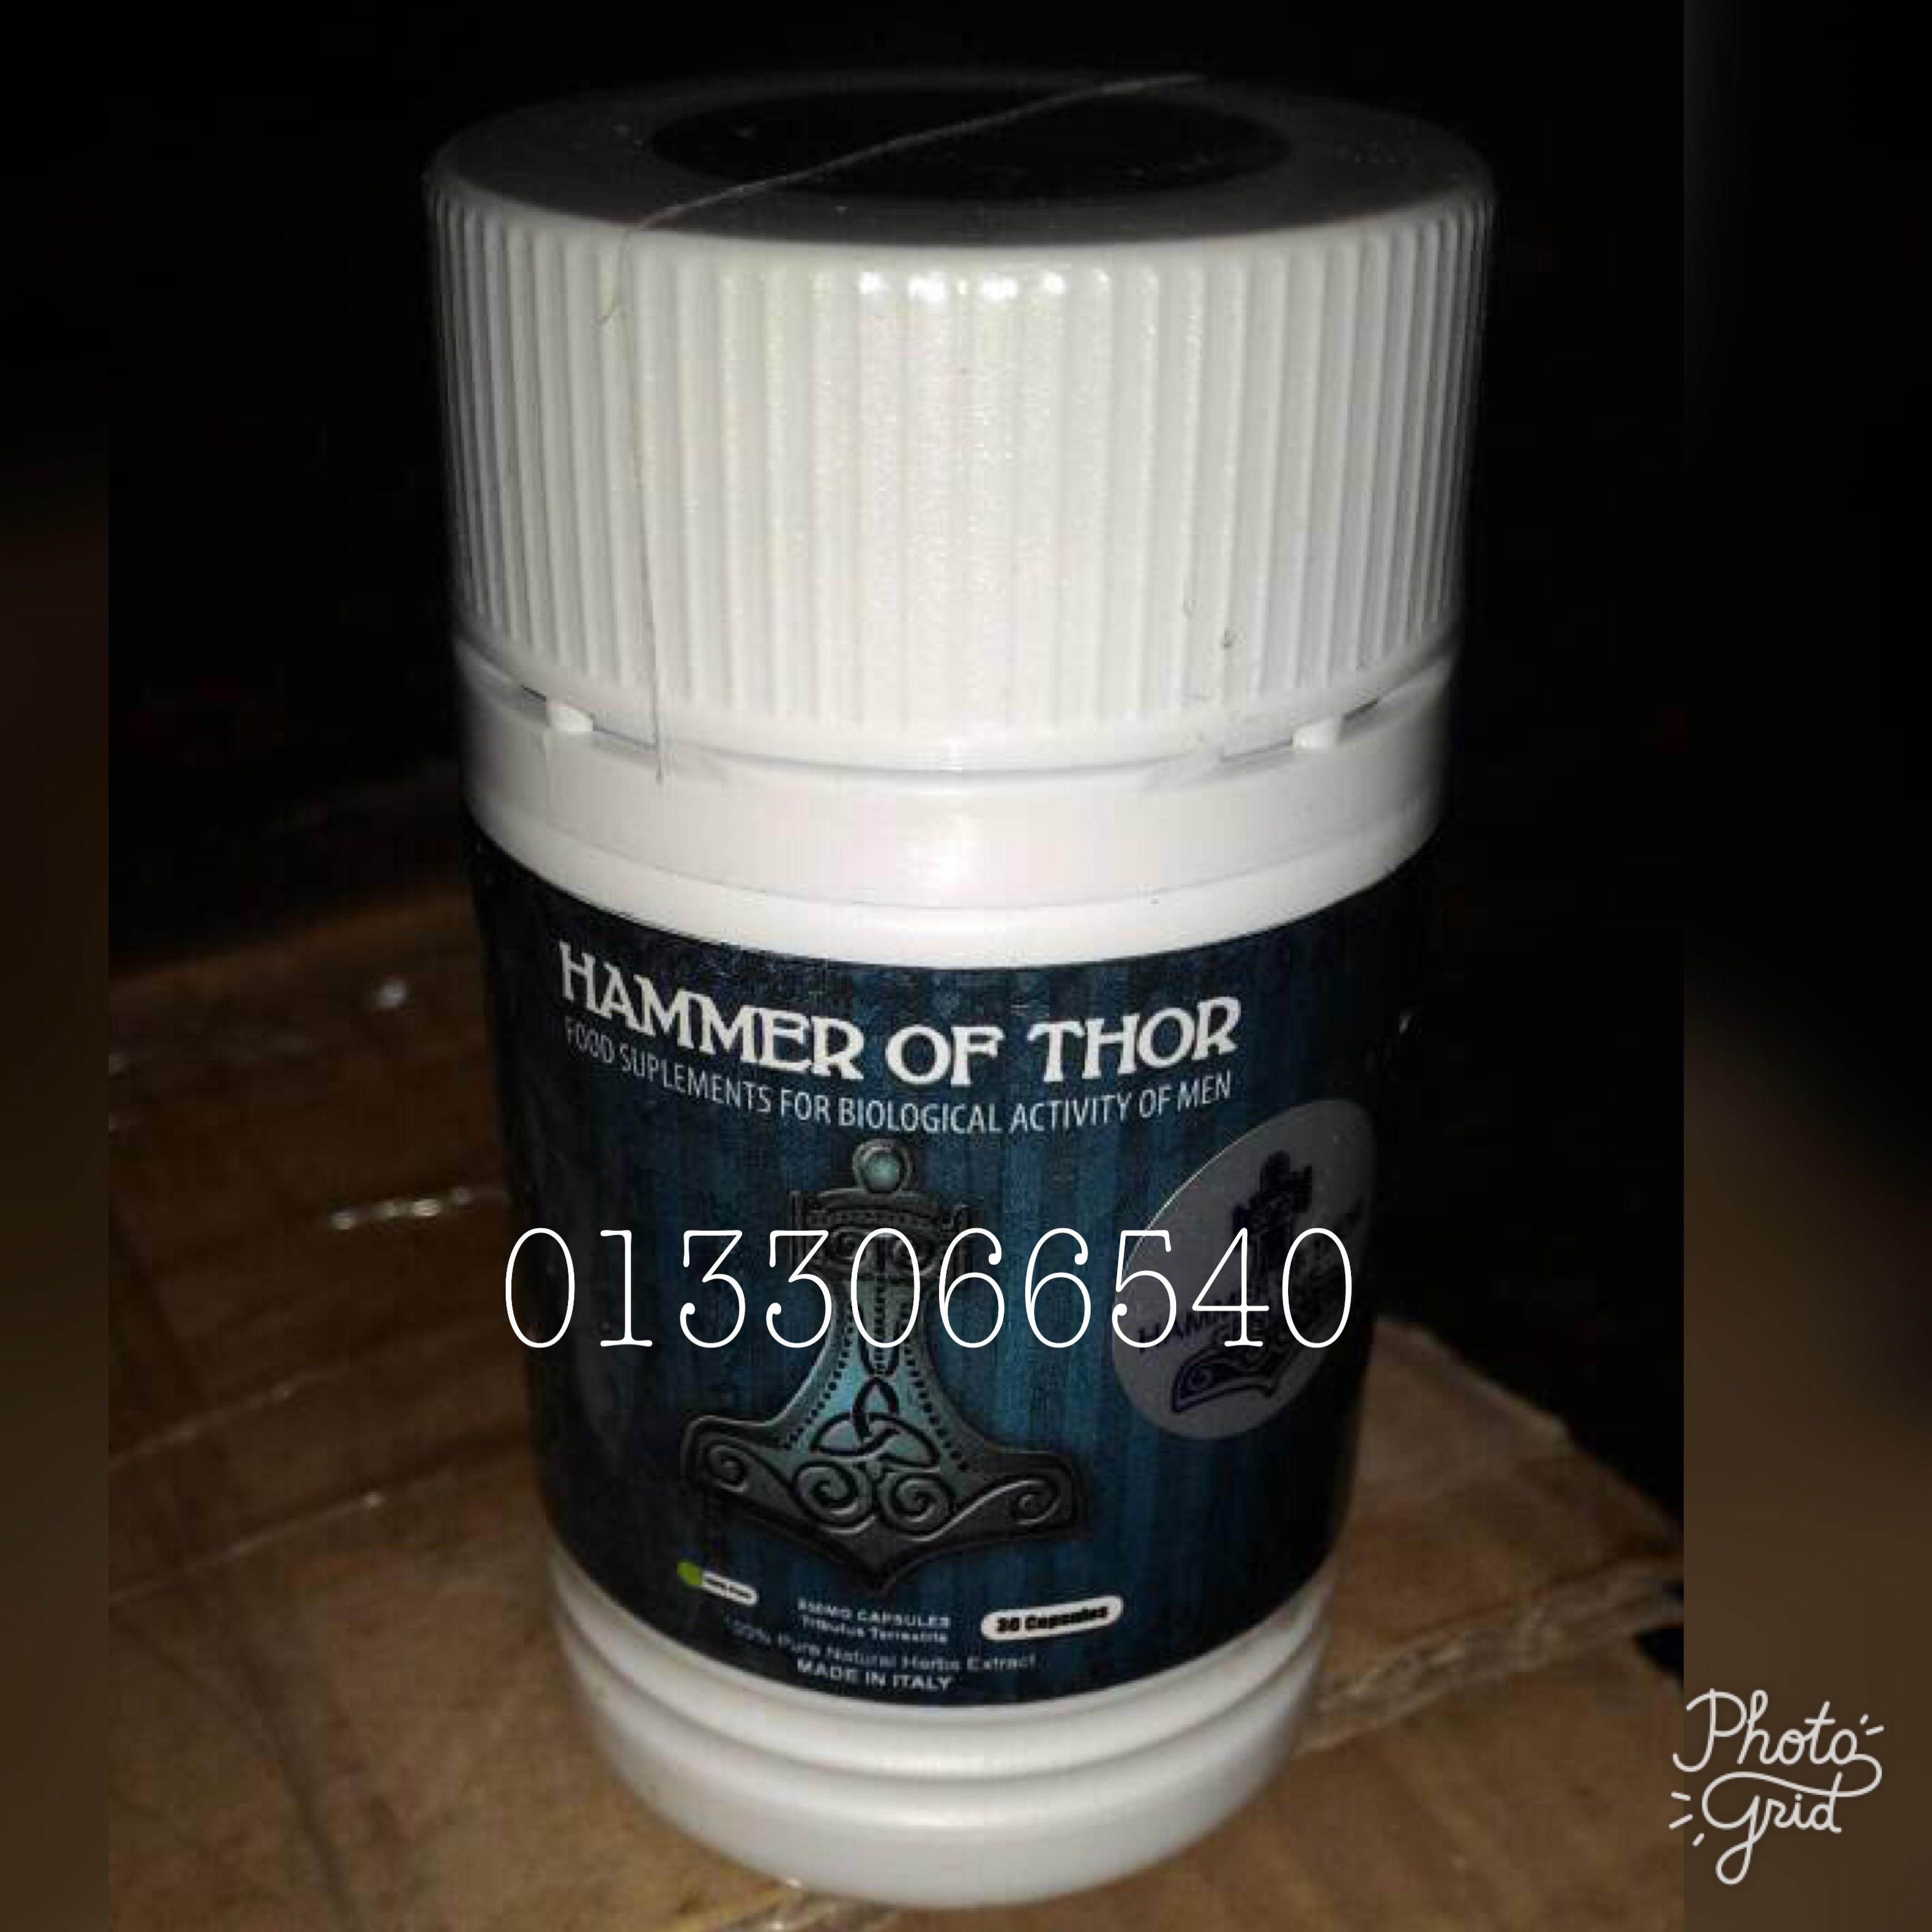 hammer of thor original italy www ubattenagabatin com